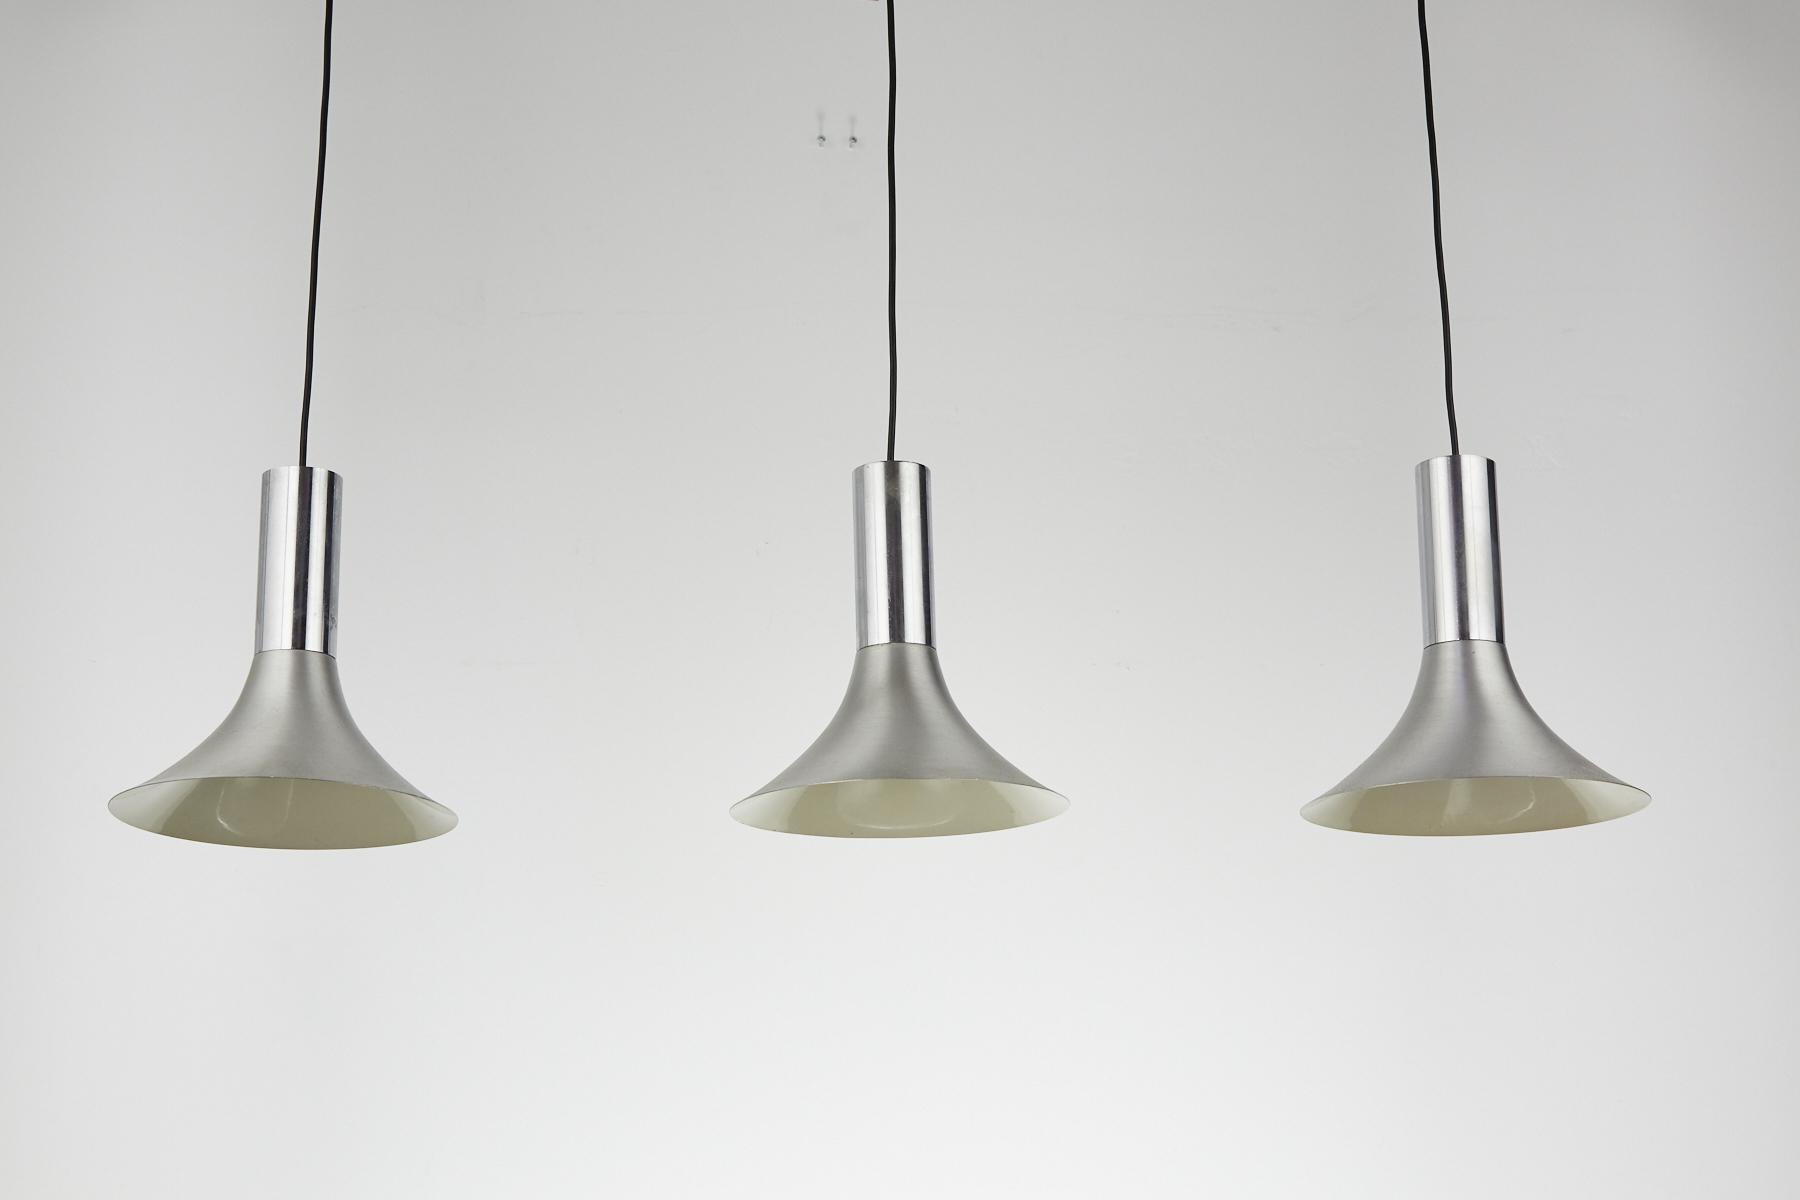 Set Of Three Chrome Danish Mid Century Modern Pendant Lights 1960s